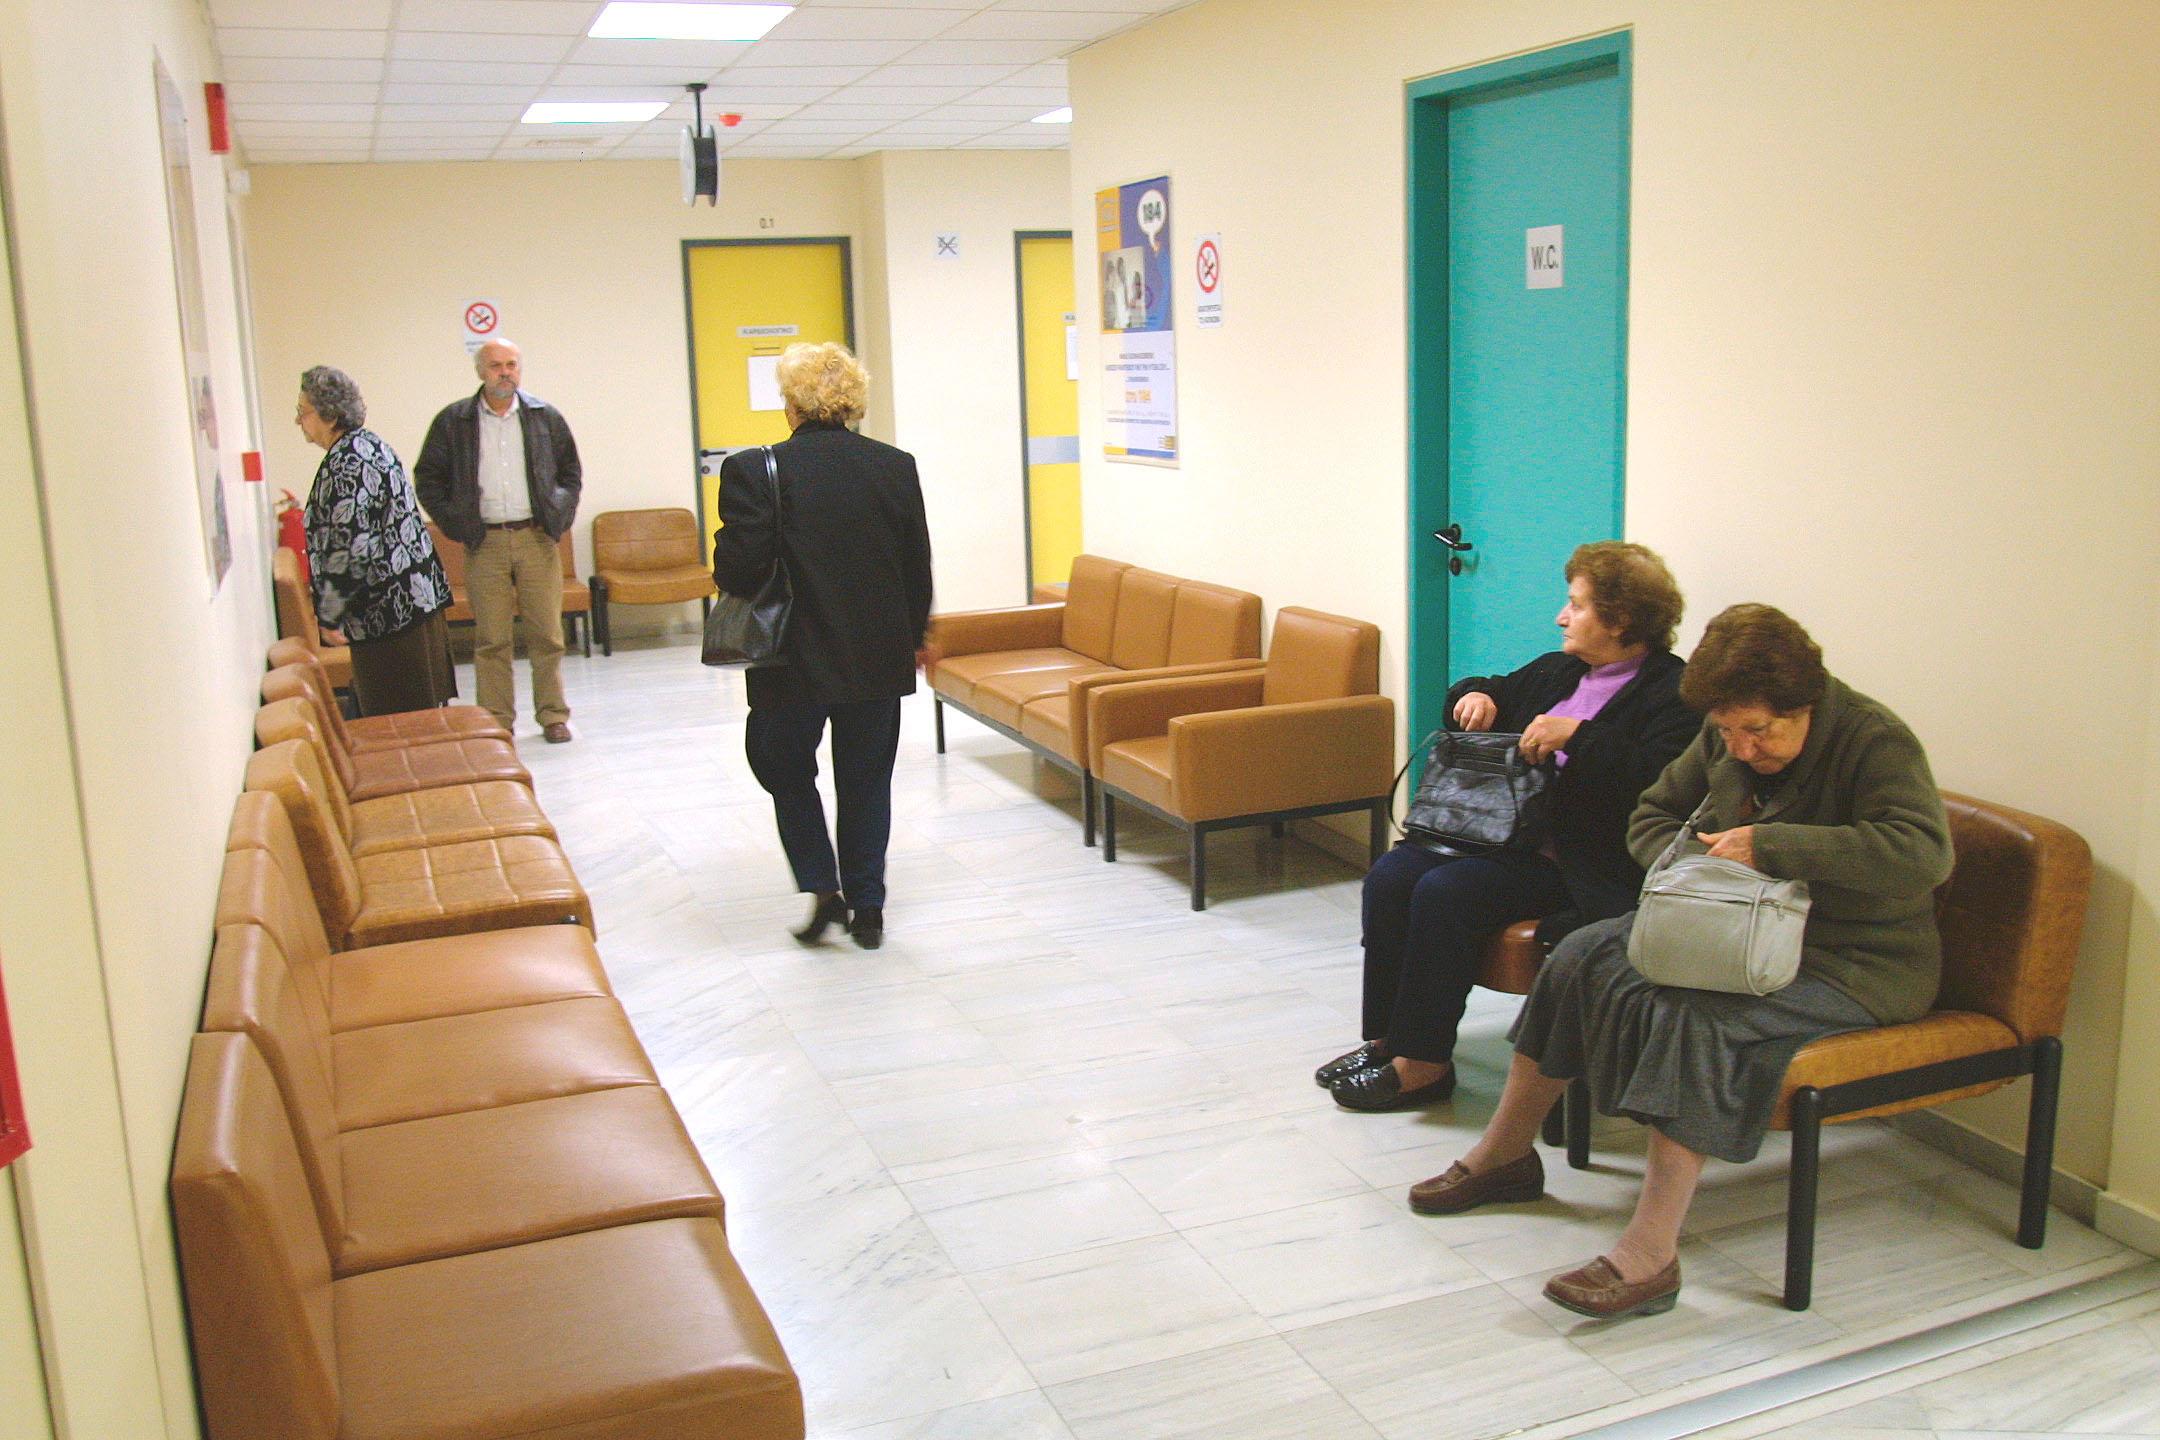 0be9304e3e ΕΟΠΥΥ Θεσσαλονίκης  Tις εξετάσεις τους θα πληρώνουν οι ασφαλισμένοι ...